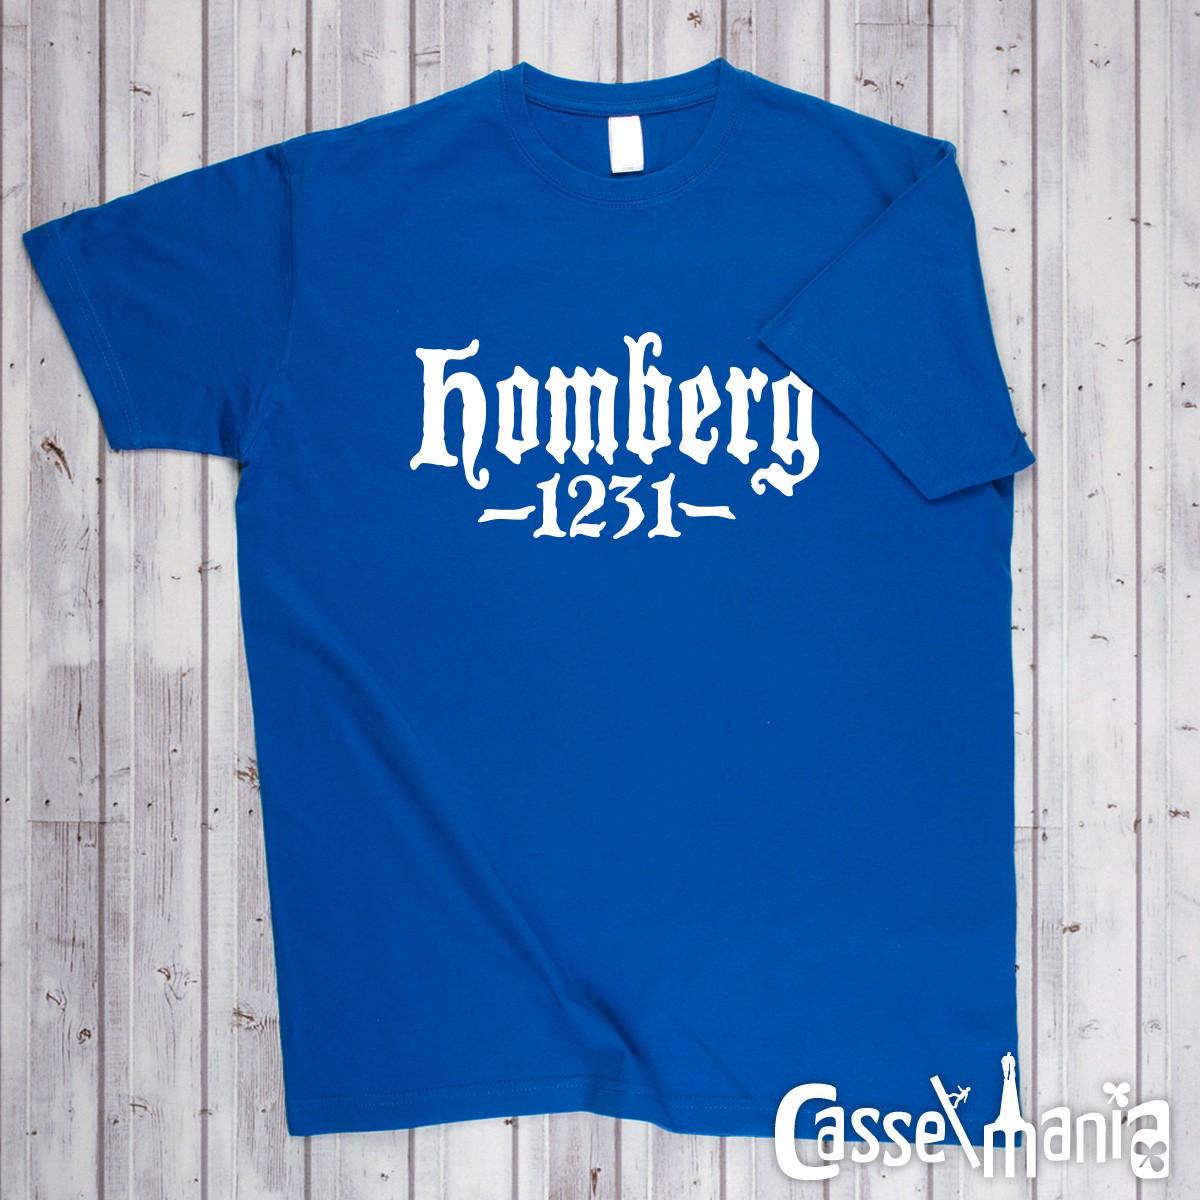 HOMBERG - 1231, UNISEX